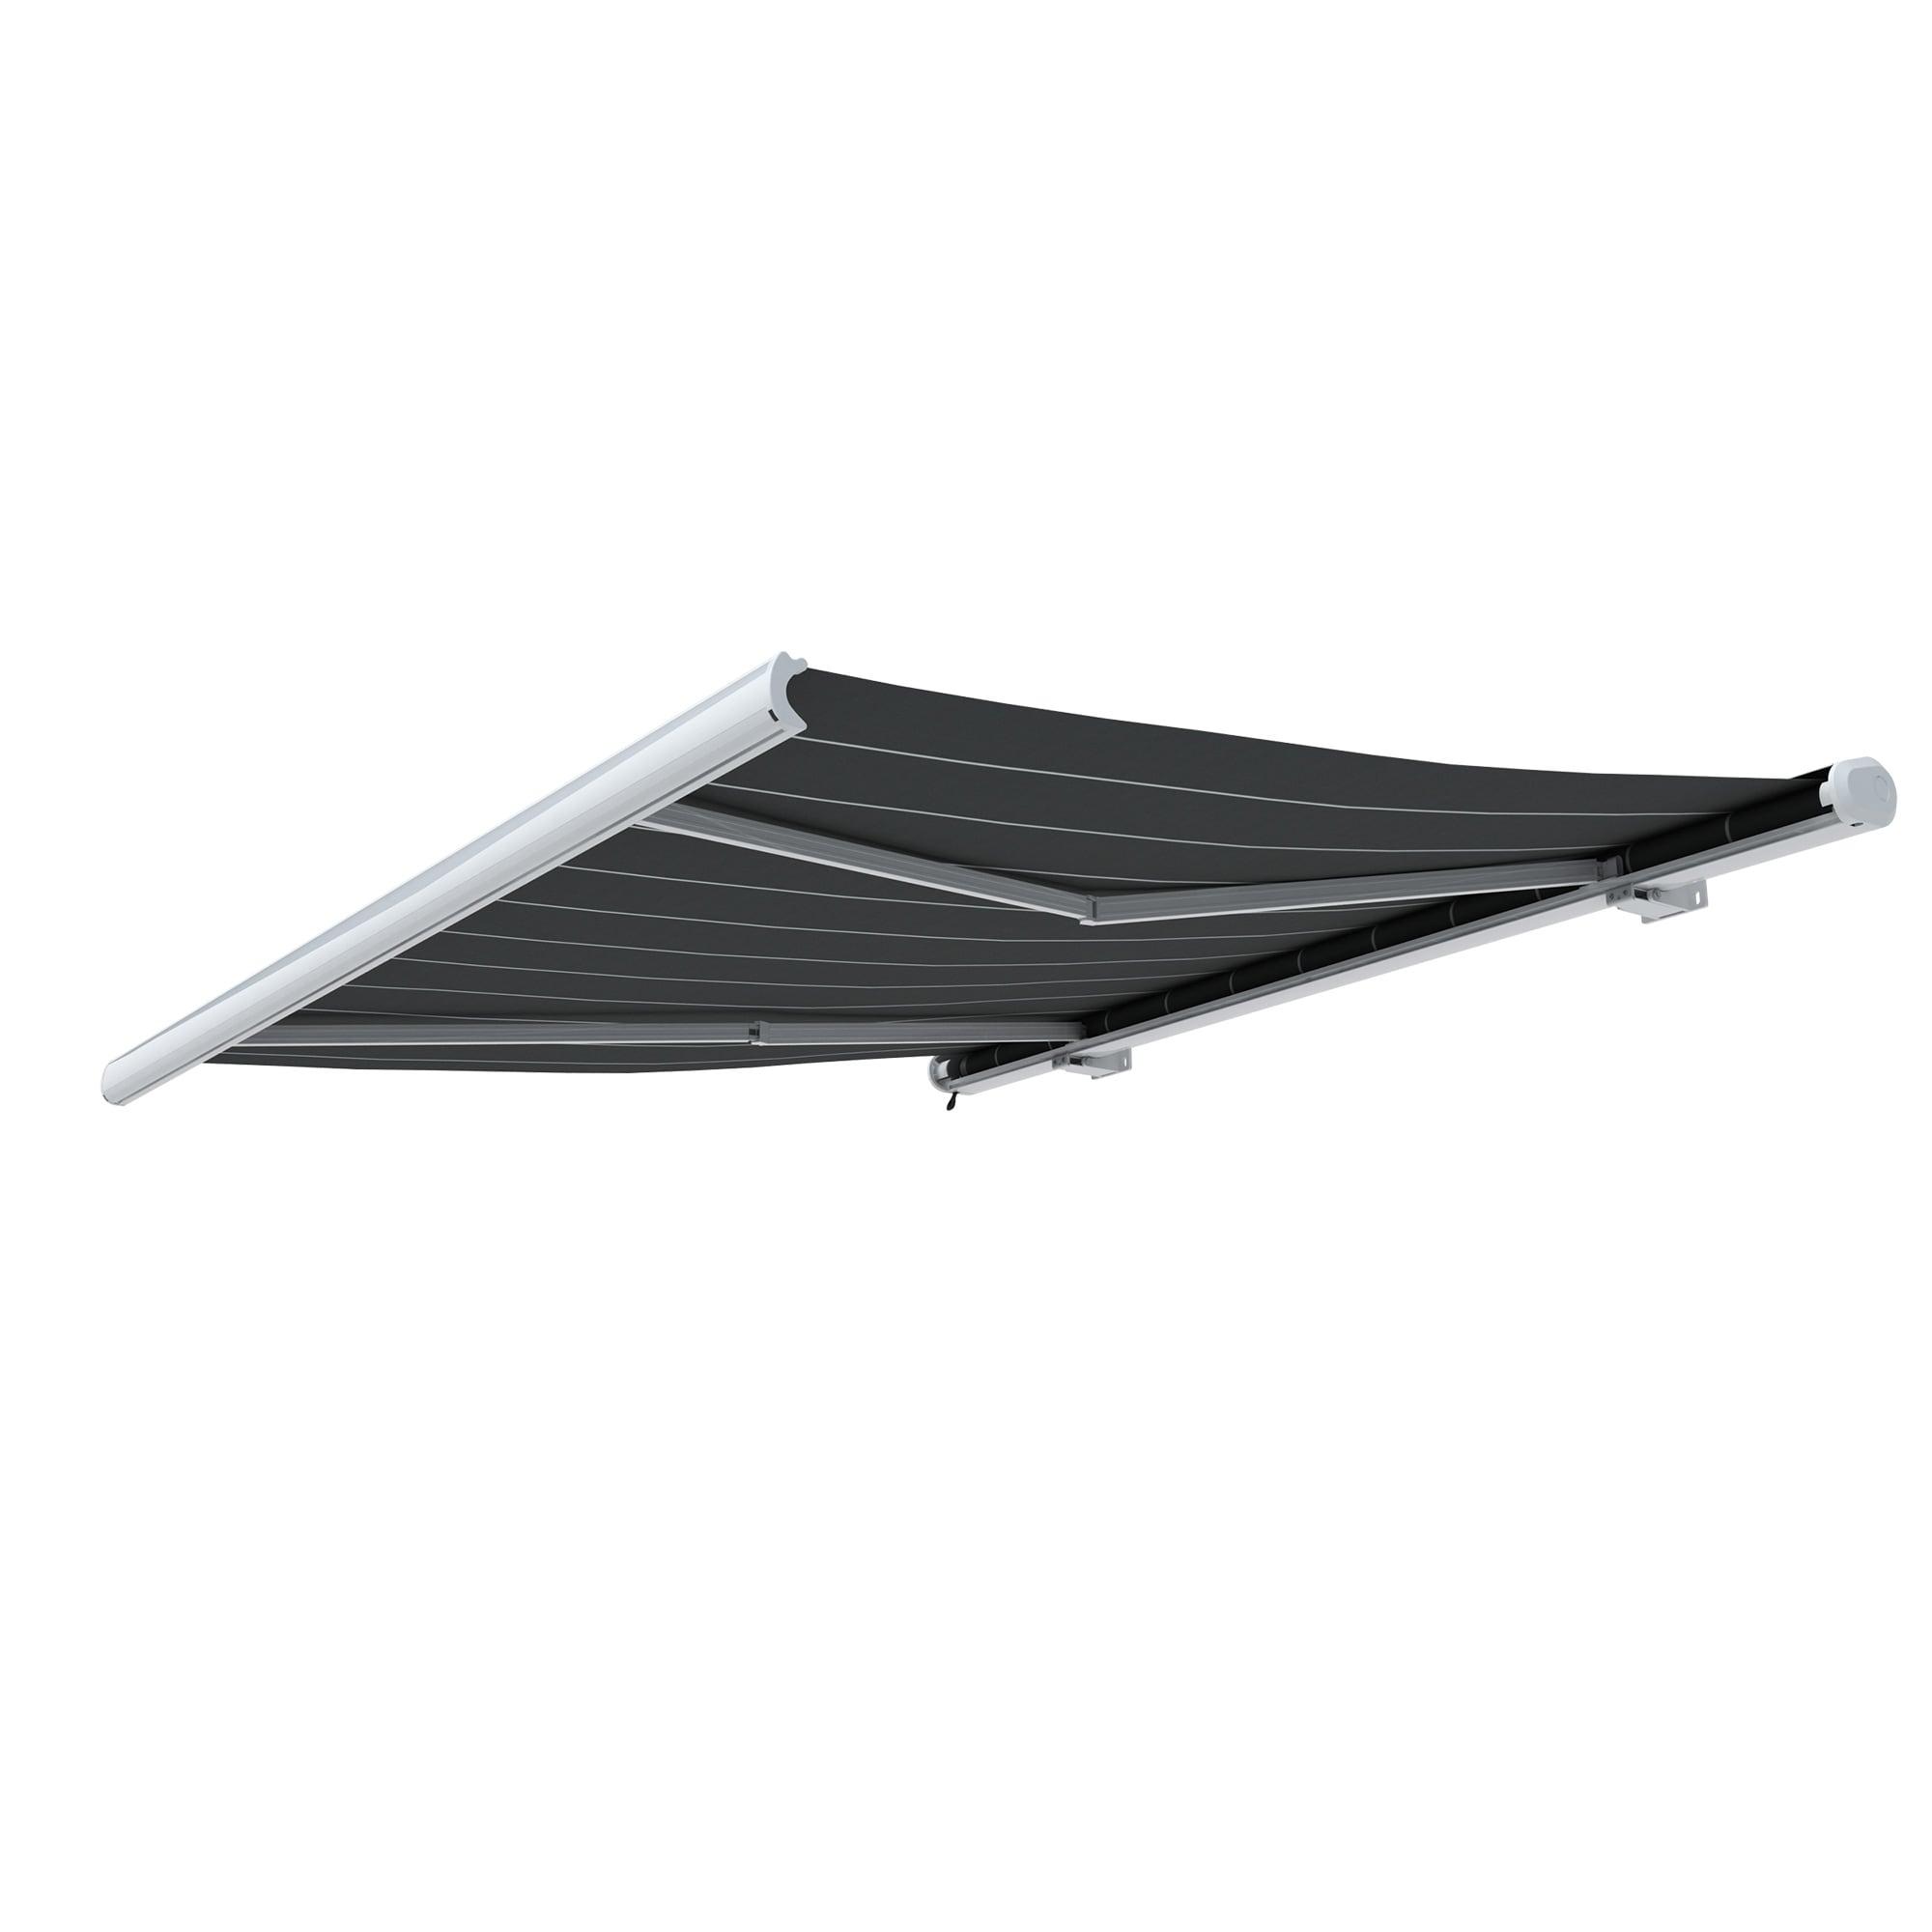 kassettenmarkise vollkassetten markise elektrisch funksteuerung paramondo curve ebay. Black Bedroom Furniture Sets. Home Design Ideas